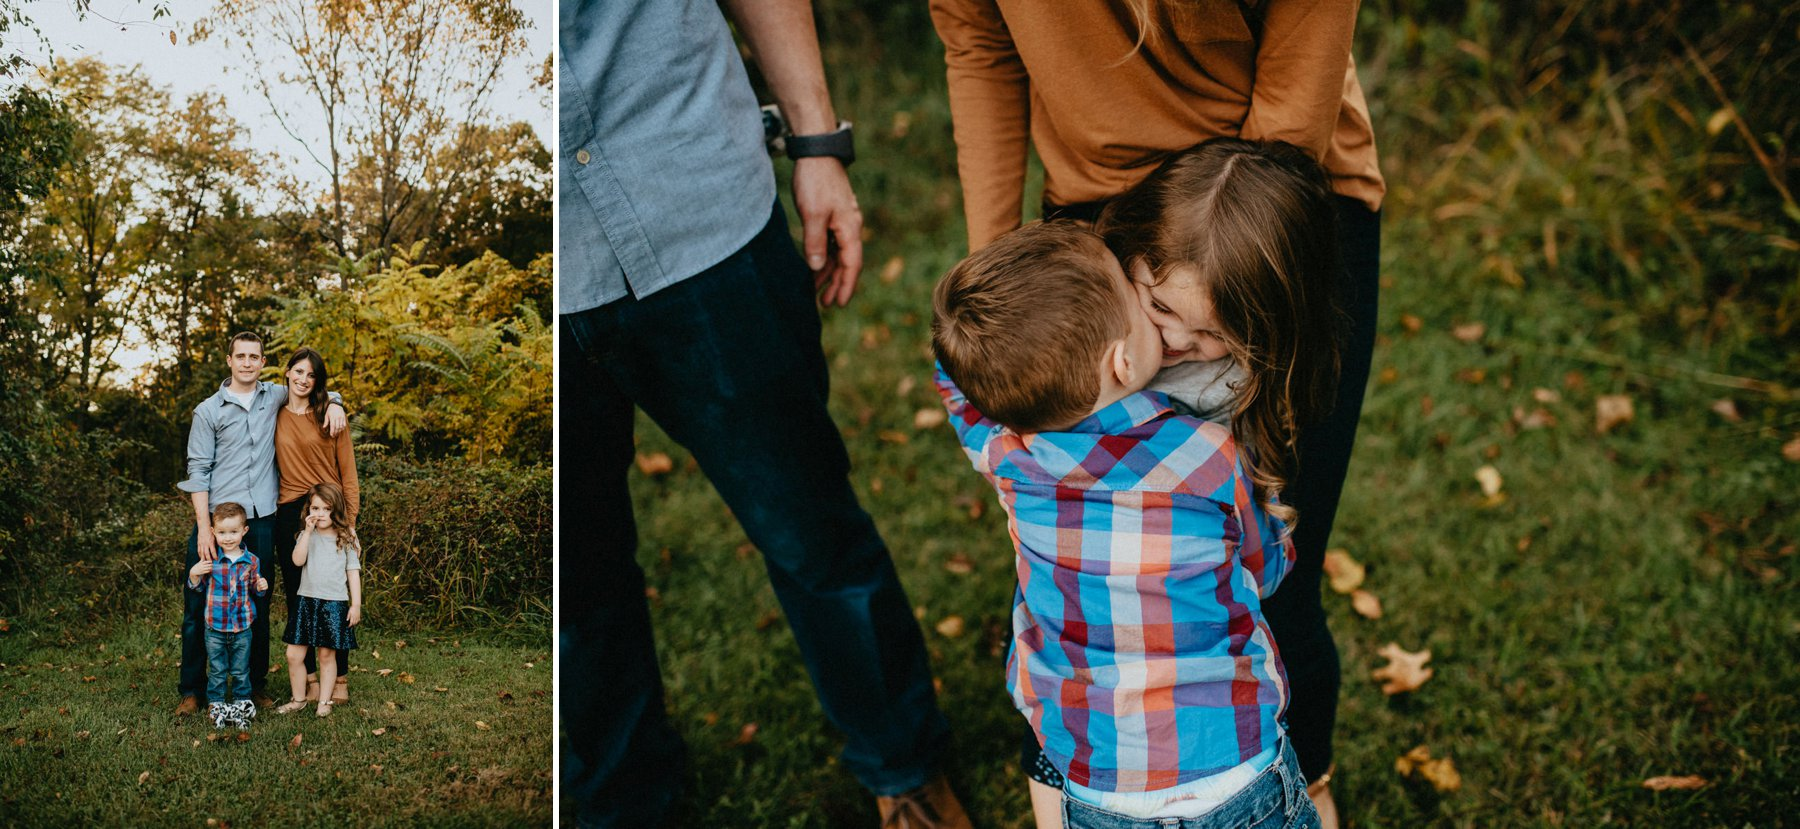 delware-pennsylvania-family-photographer-70.jpg